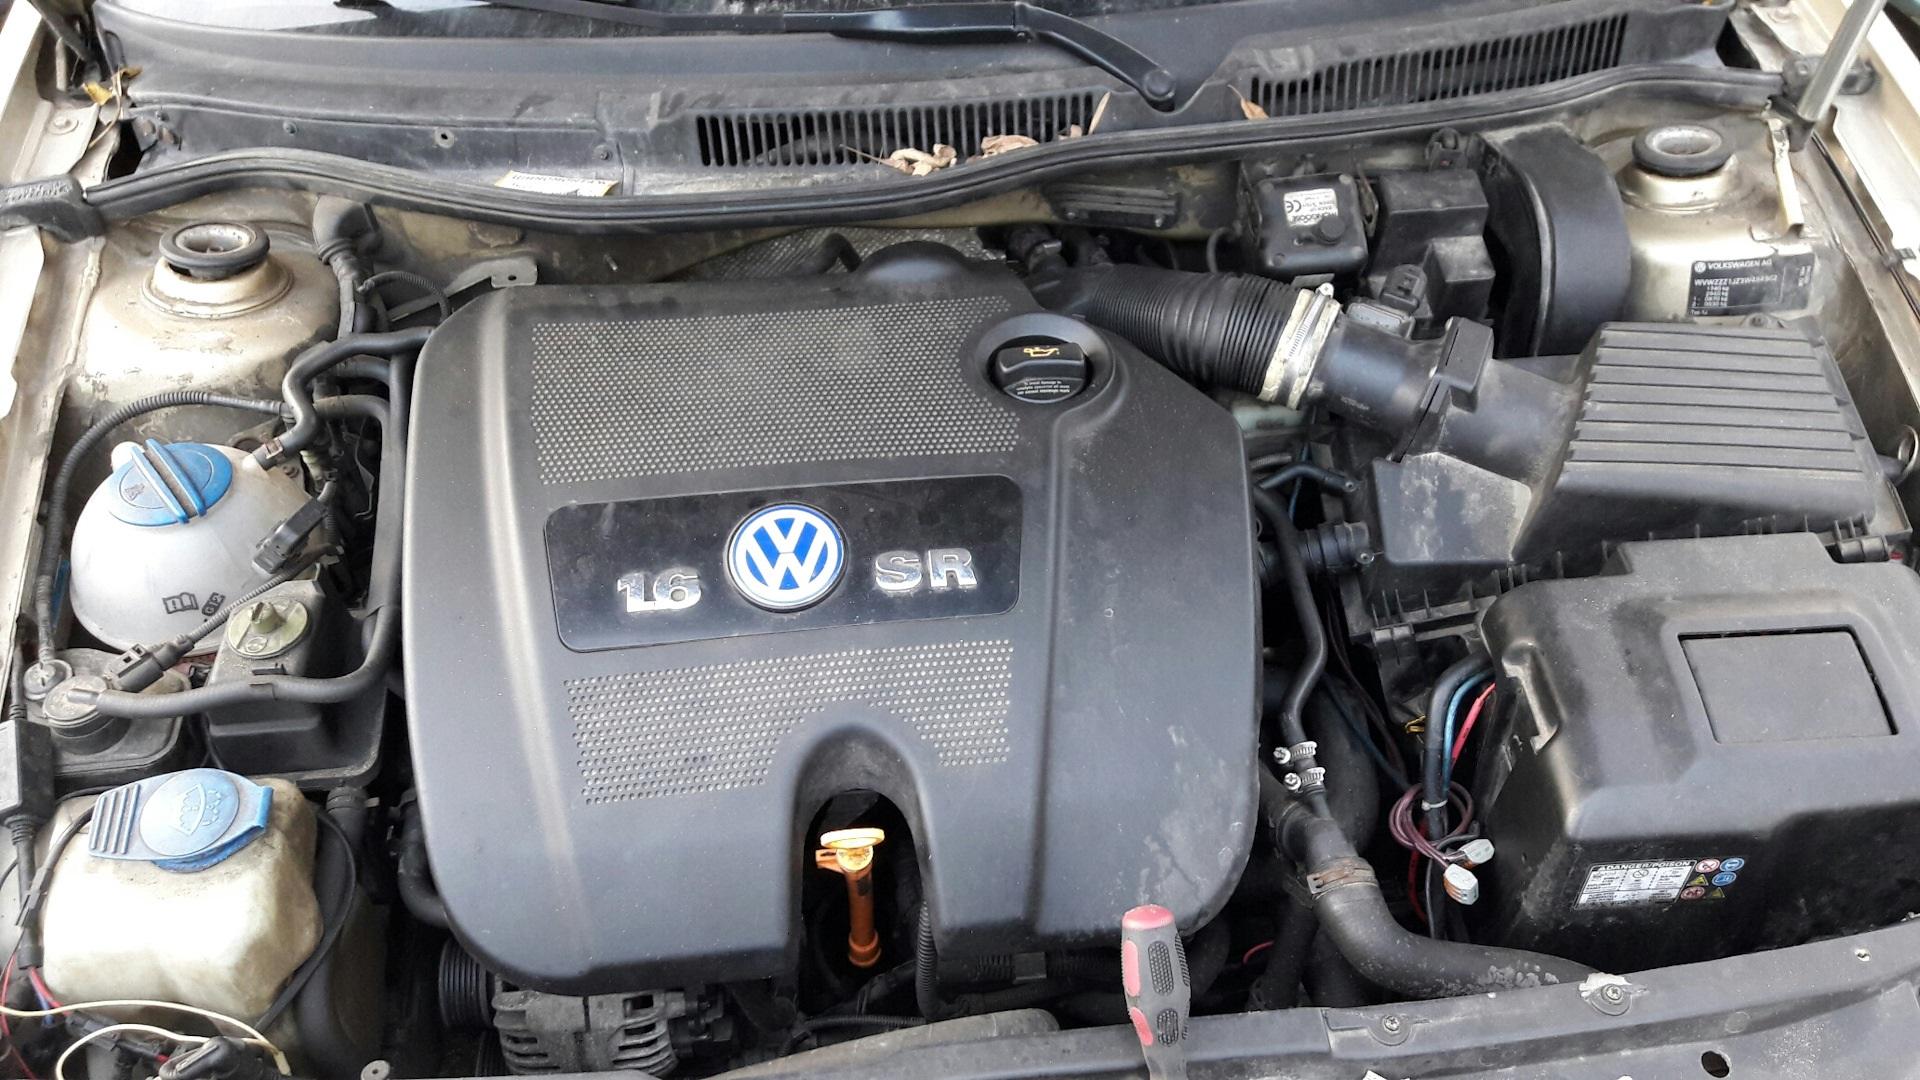 VW Bora 2.0 под капотом